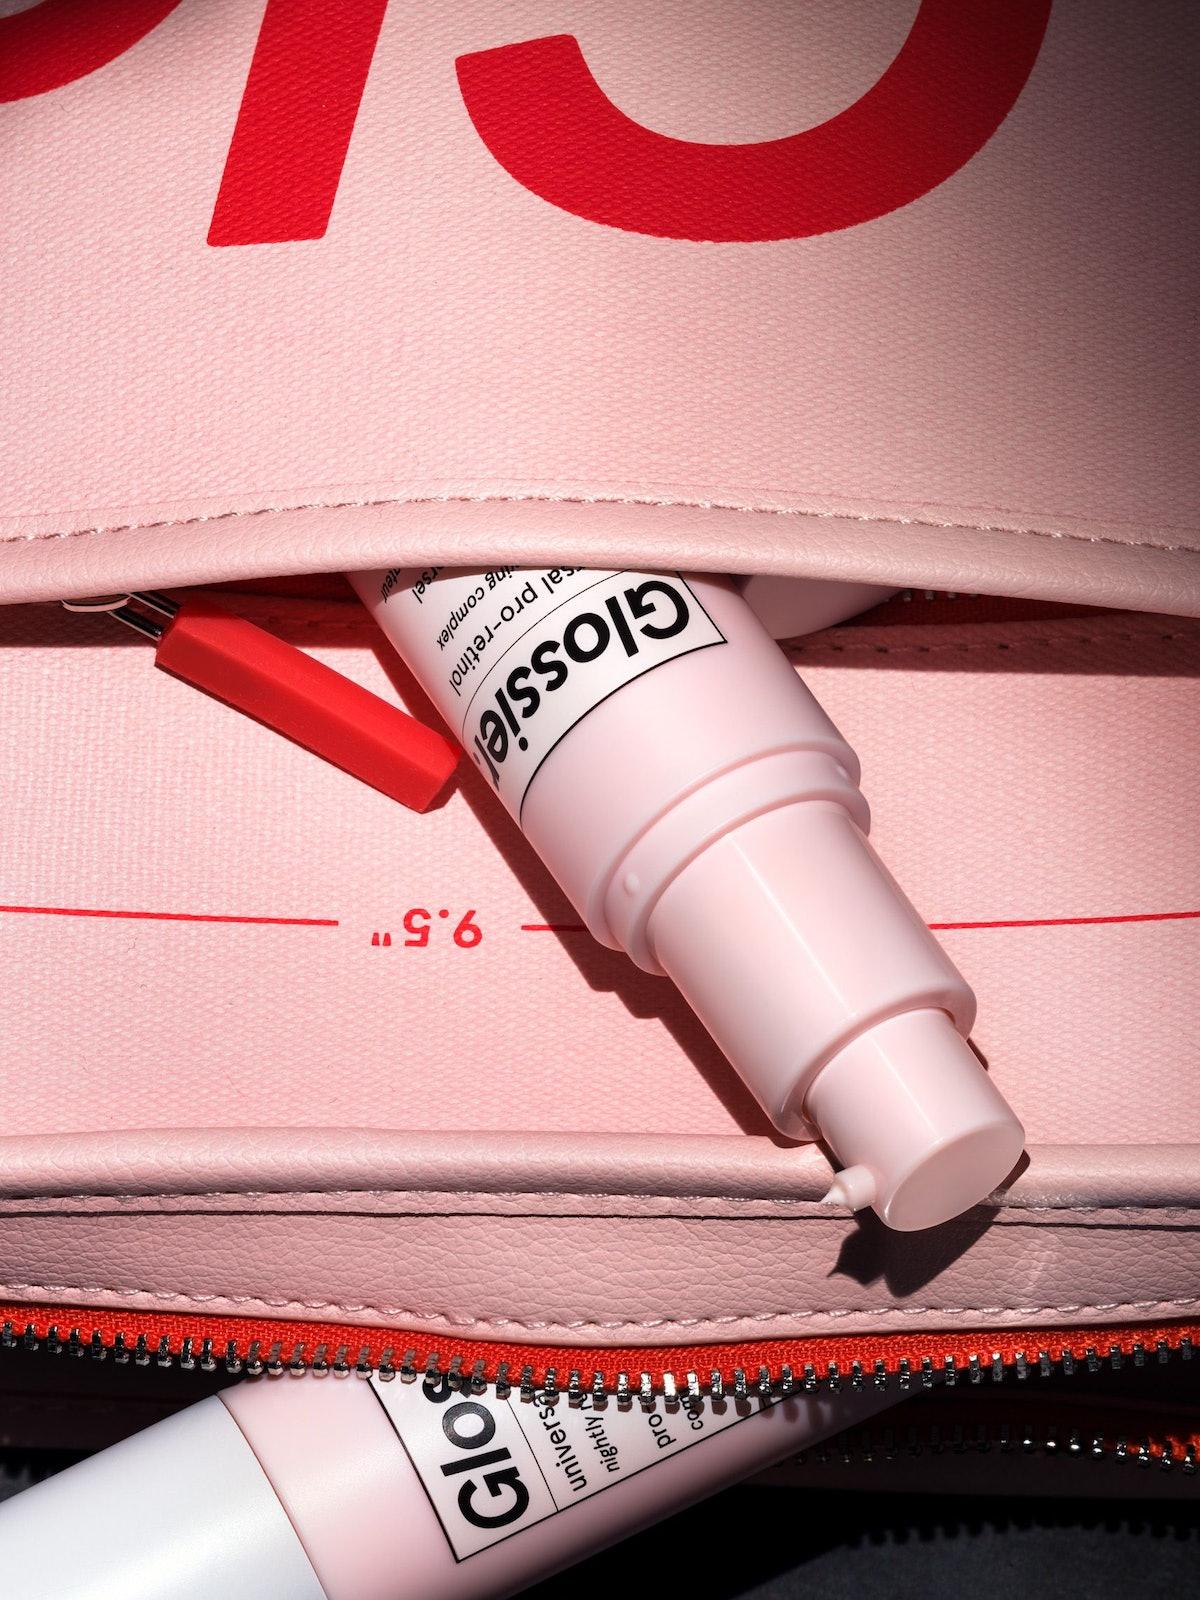 Glossier Universal Pro-Retinol peeking out of bag